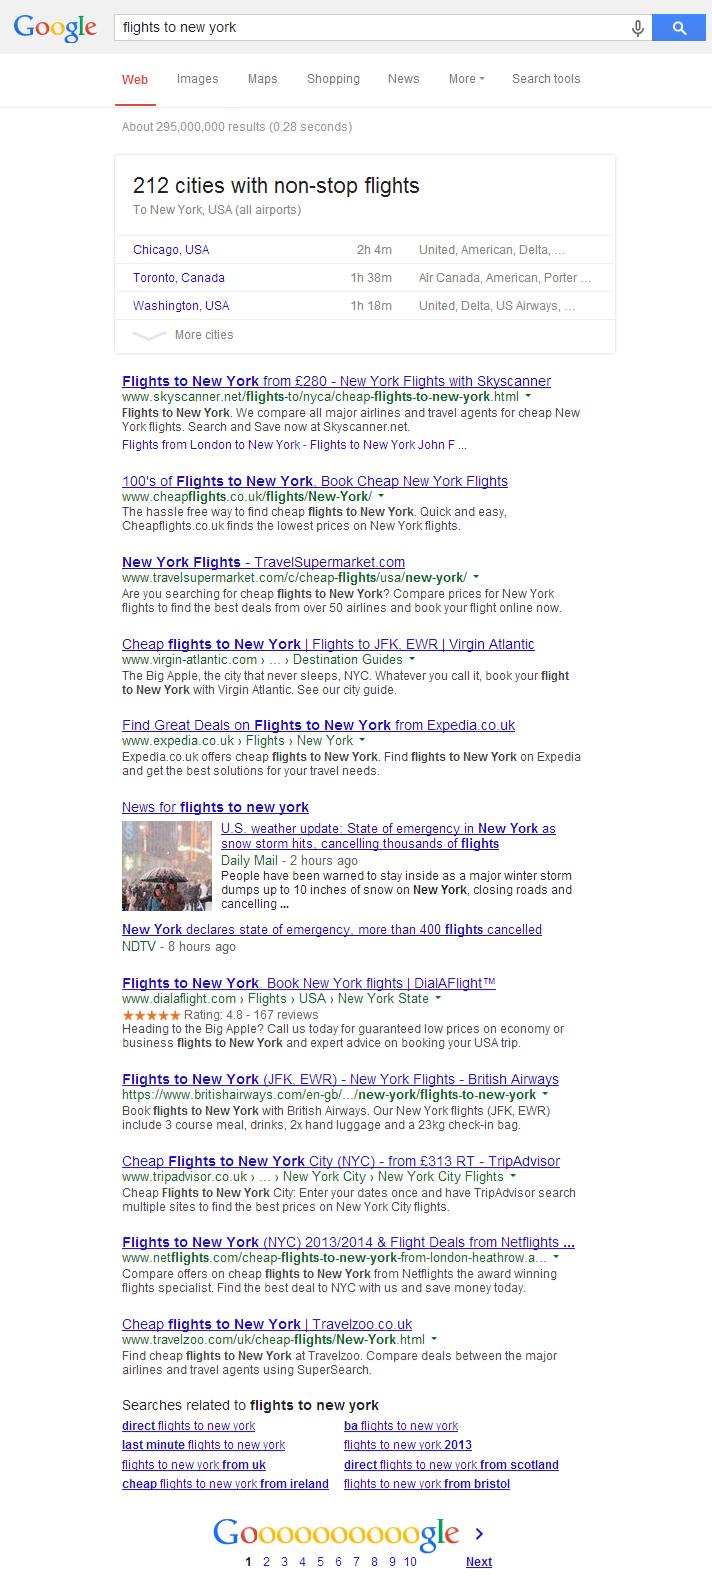 Google Flights to New York Result